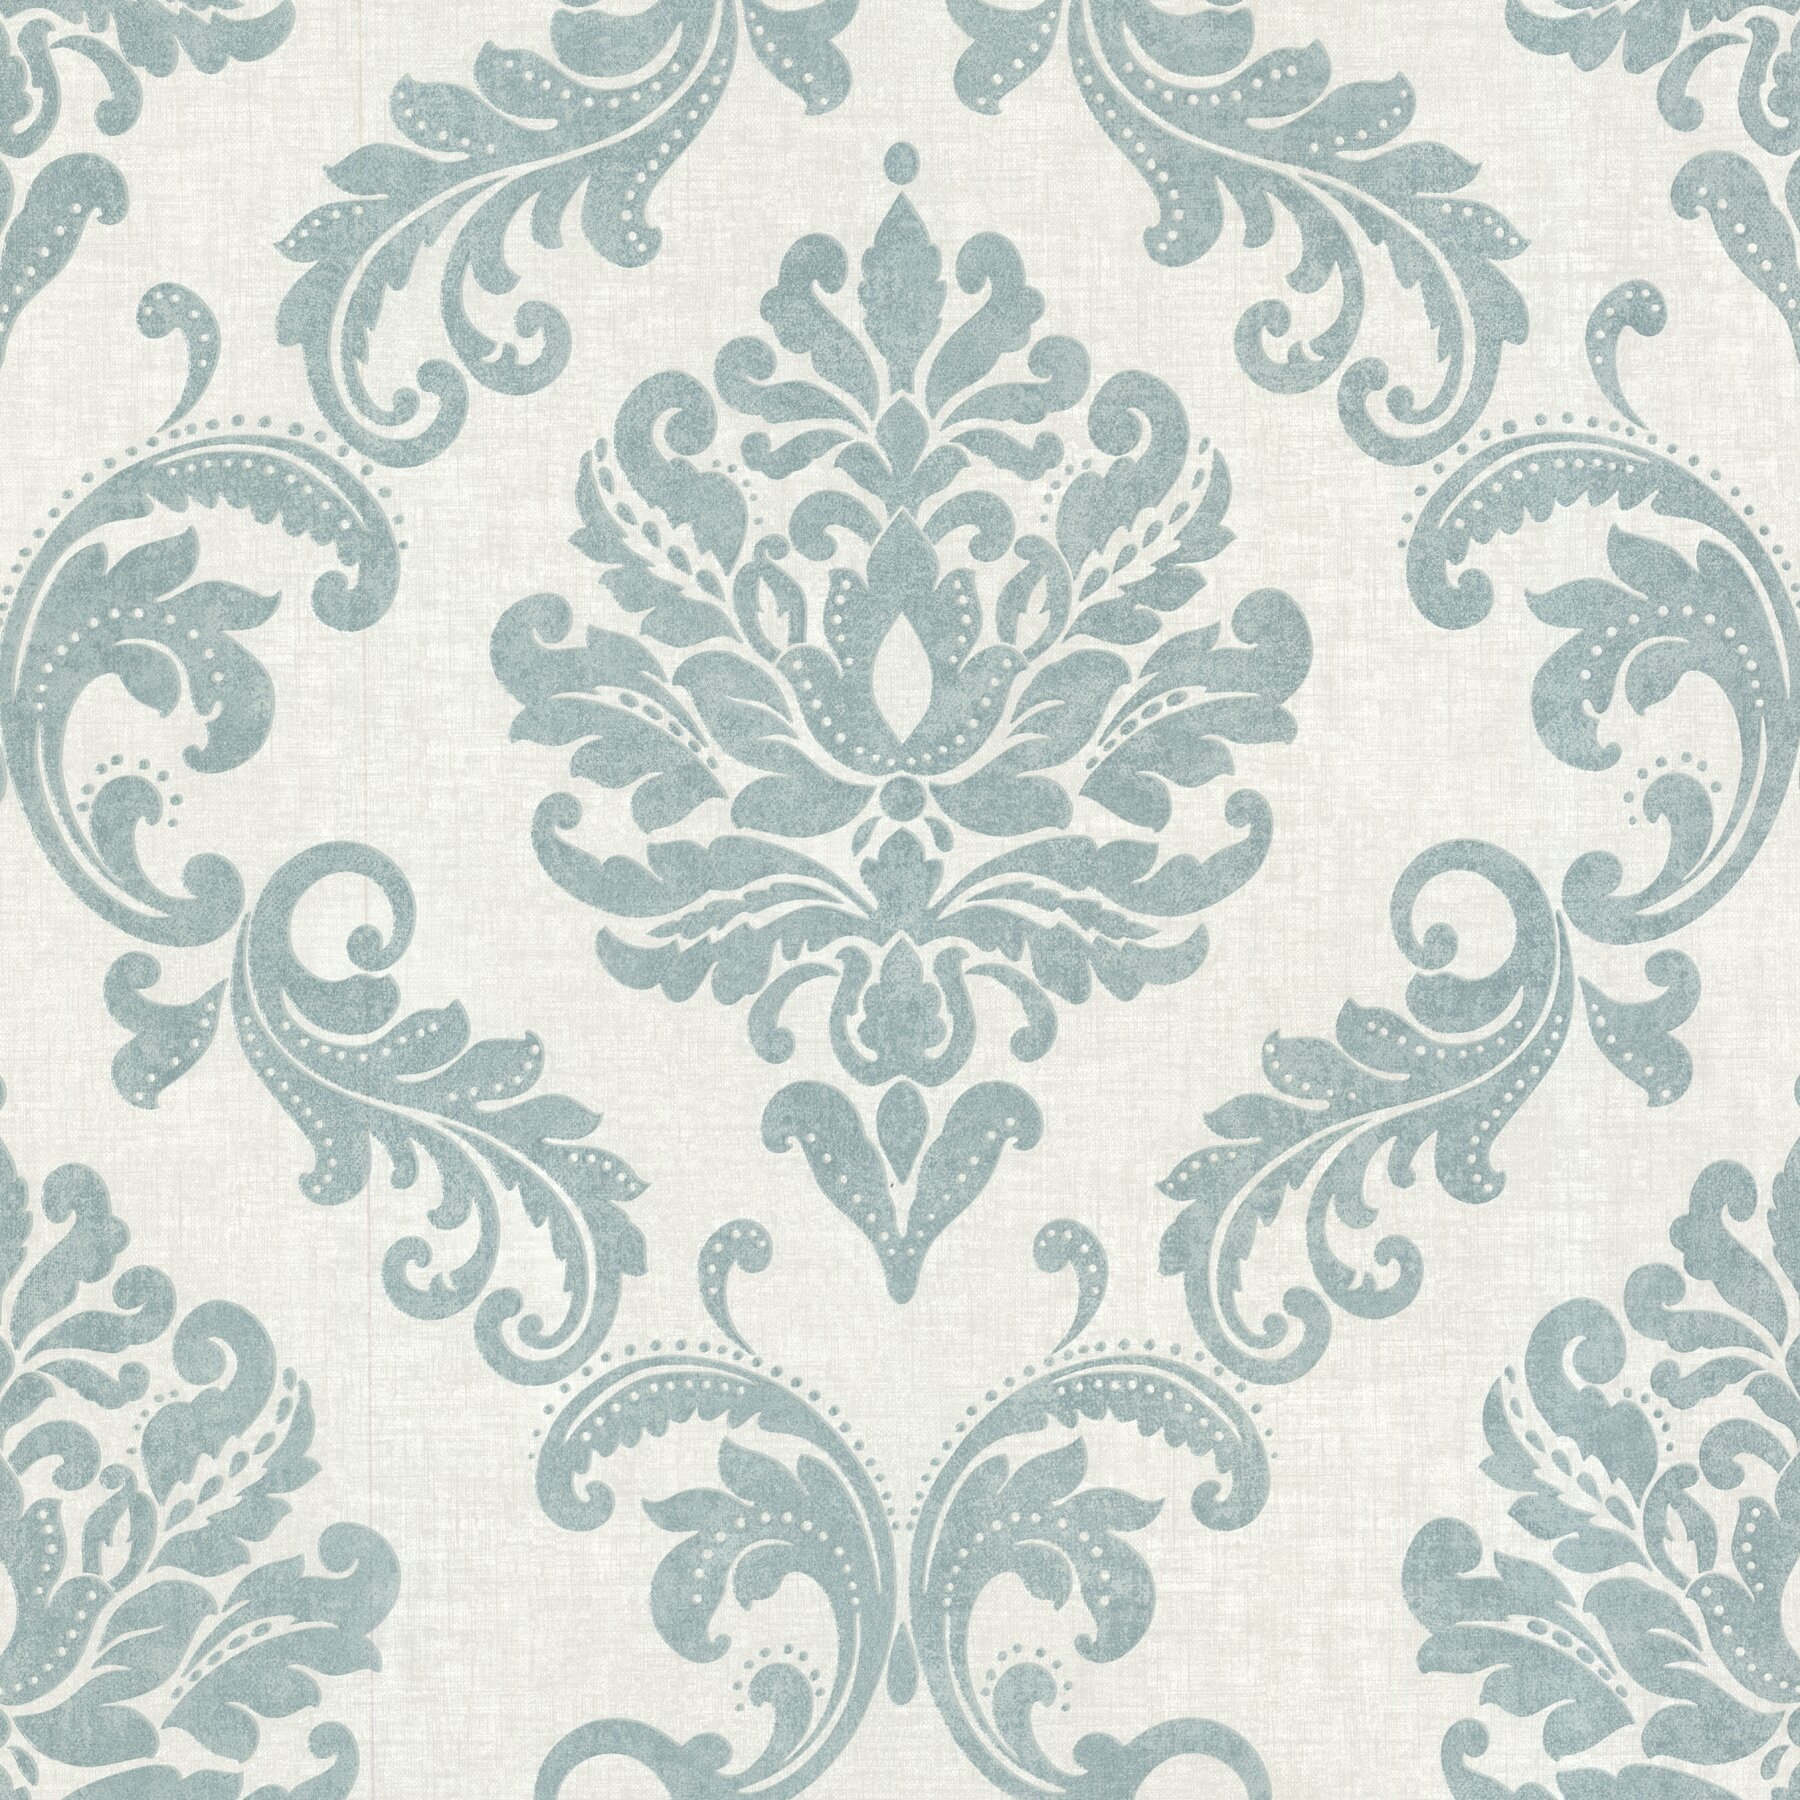 Brewster home fashions zinc sebastion 33 39 x 20 5 damask for 3d embossed wallpaper